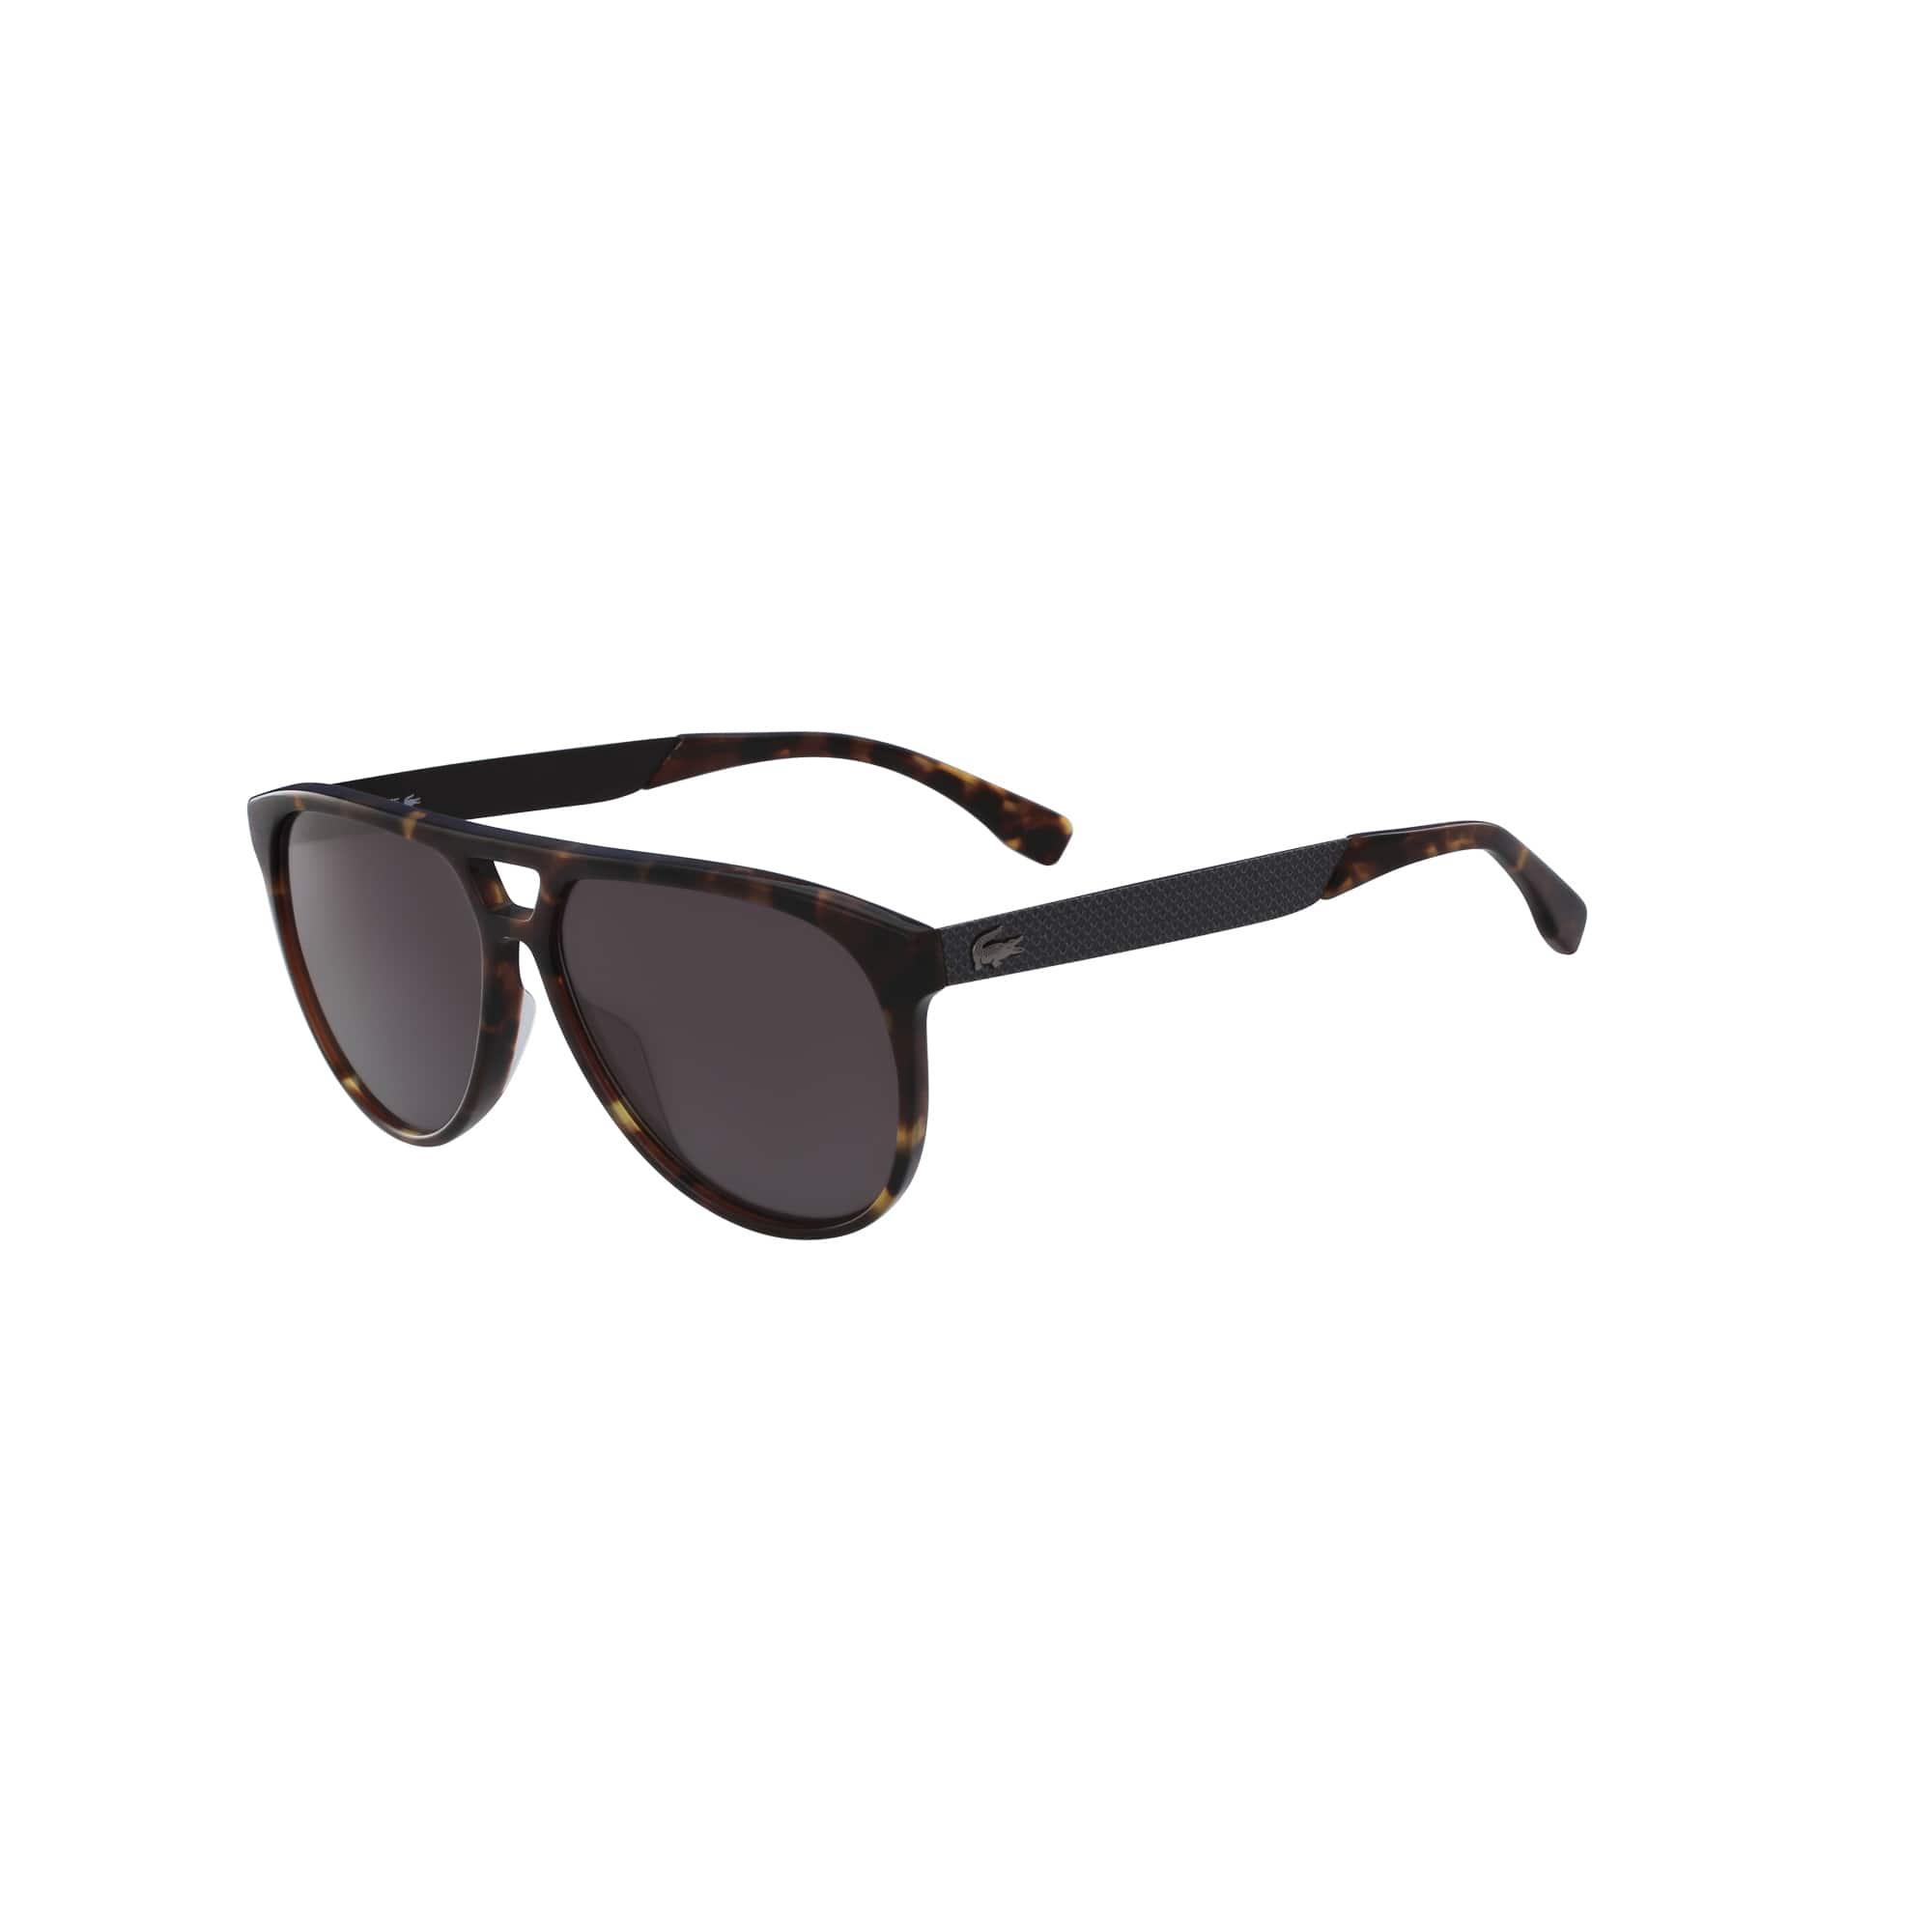 ebcce5ee48 Sunglasses